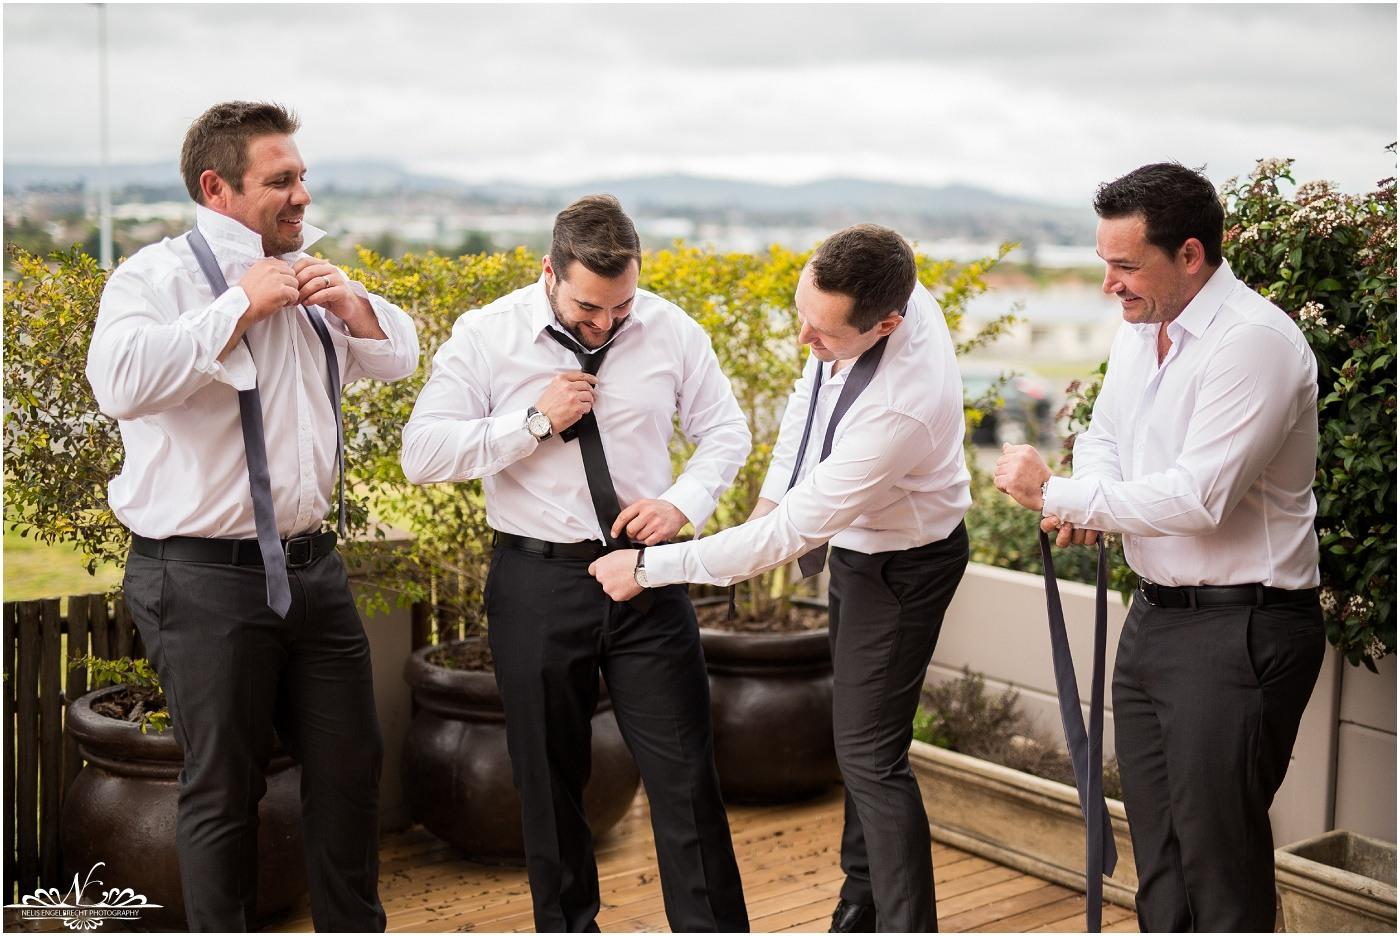 Eensgezind-Wedding-Photos-Nelis-Engelbrecht-Photography-010